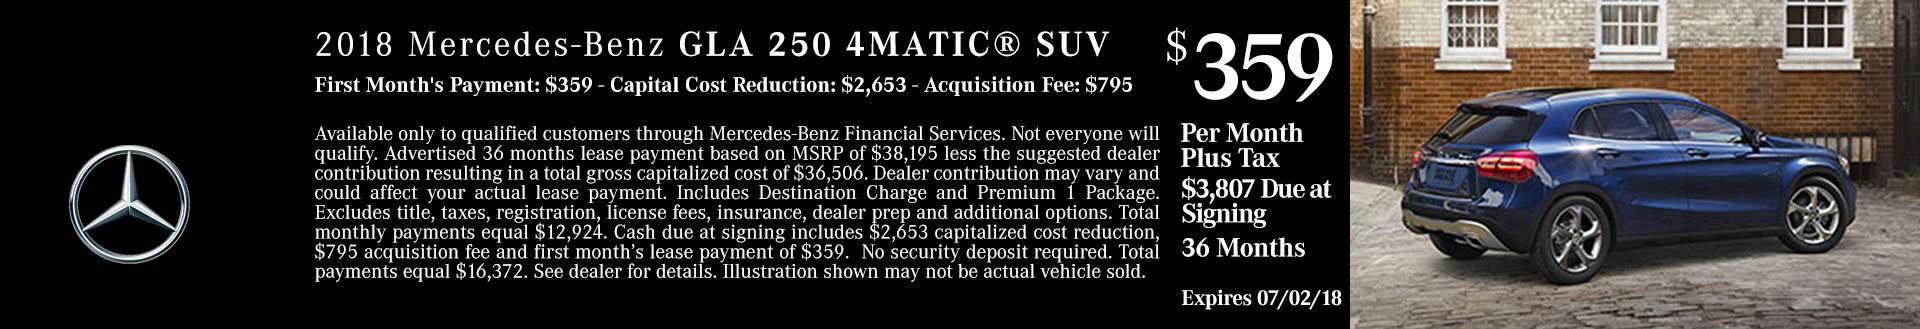 2018 Mercedes GLA 250 4MATIC SUV For Sale Boise